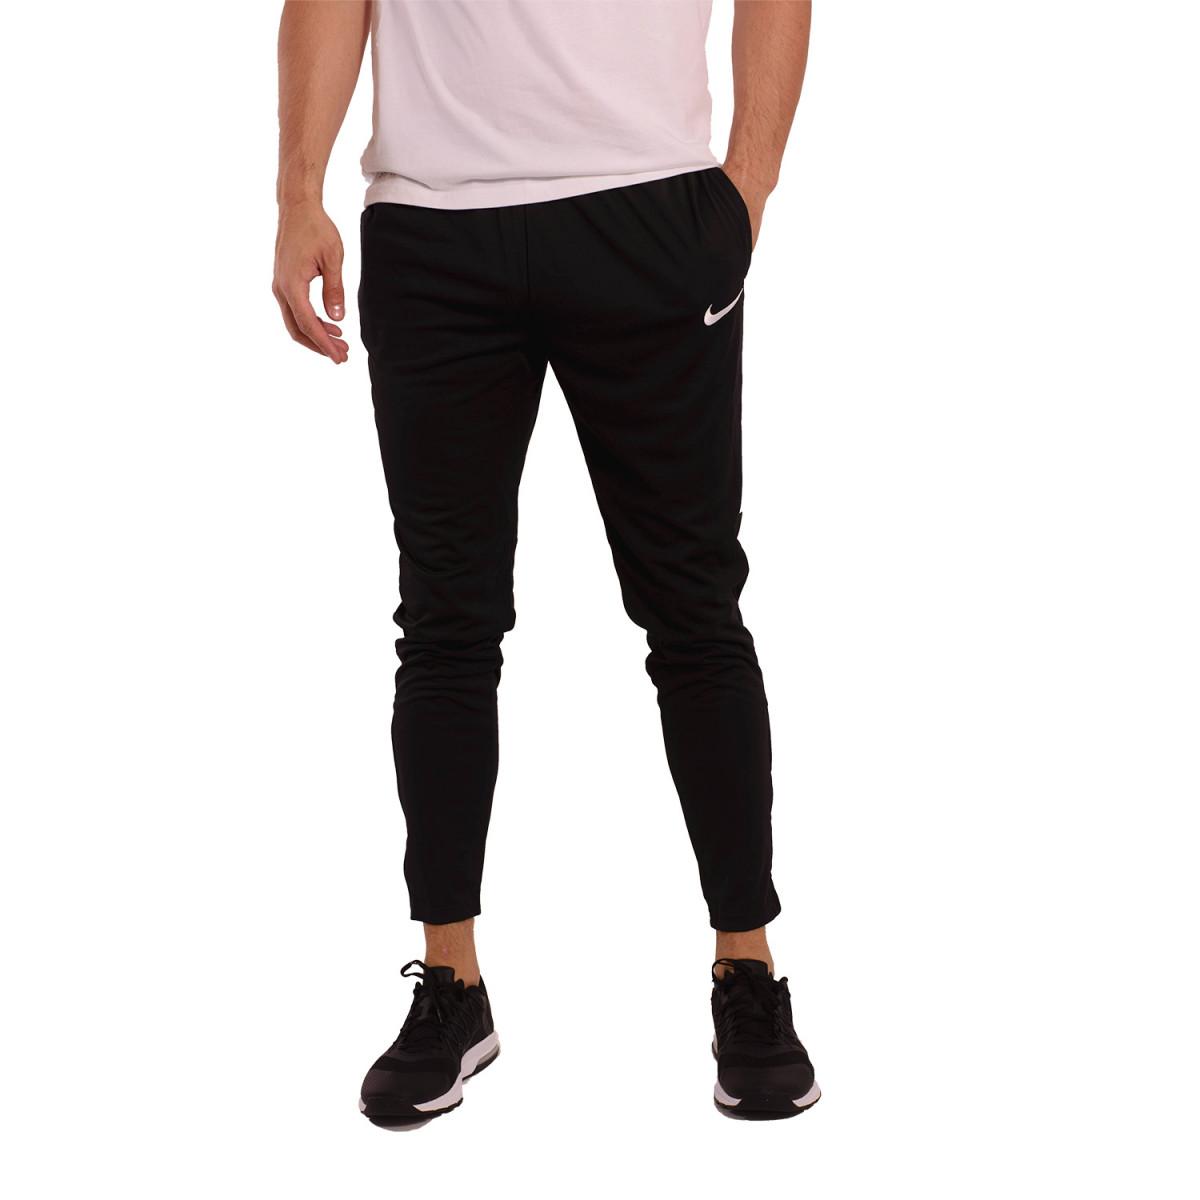 Pantalón Nike Dry Academy - Nike - Marca 5cf806bc73388